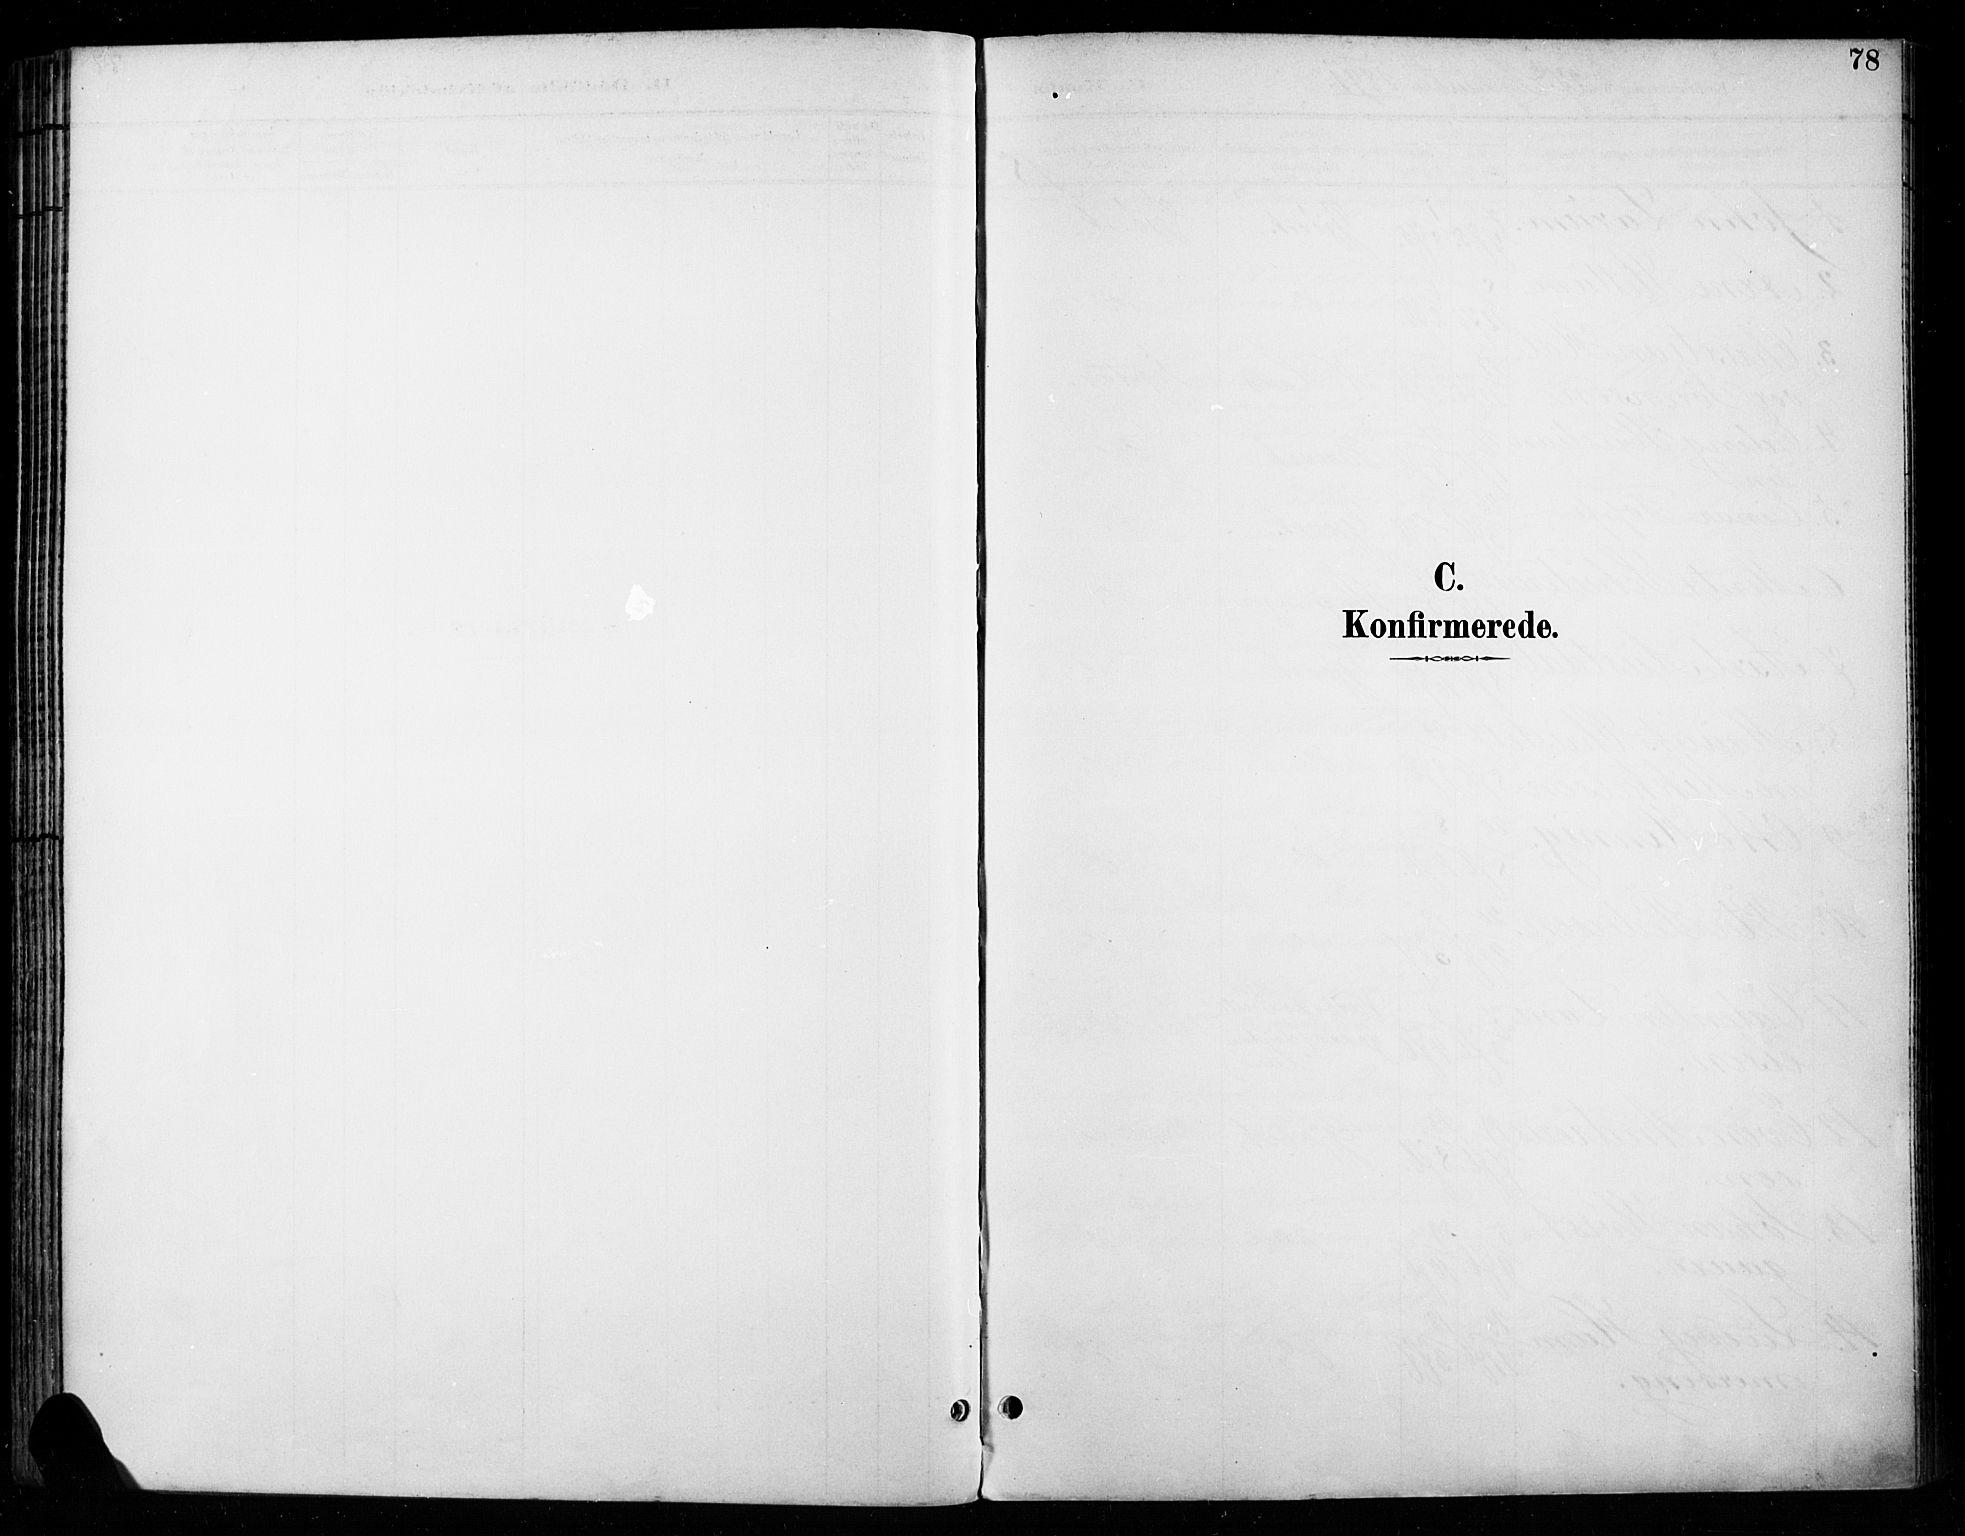 SAH, Vardal prestekontor, H/Ha/Haa/L0011: Ministerialbok nr. 11, 1891-1901, s. 78